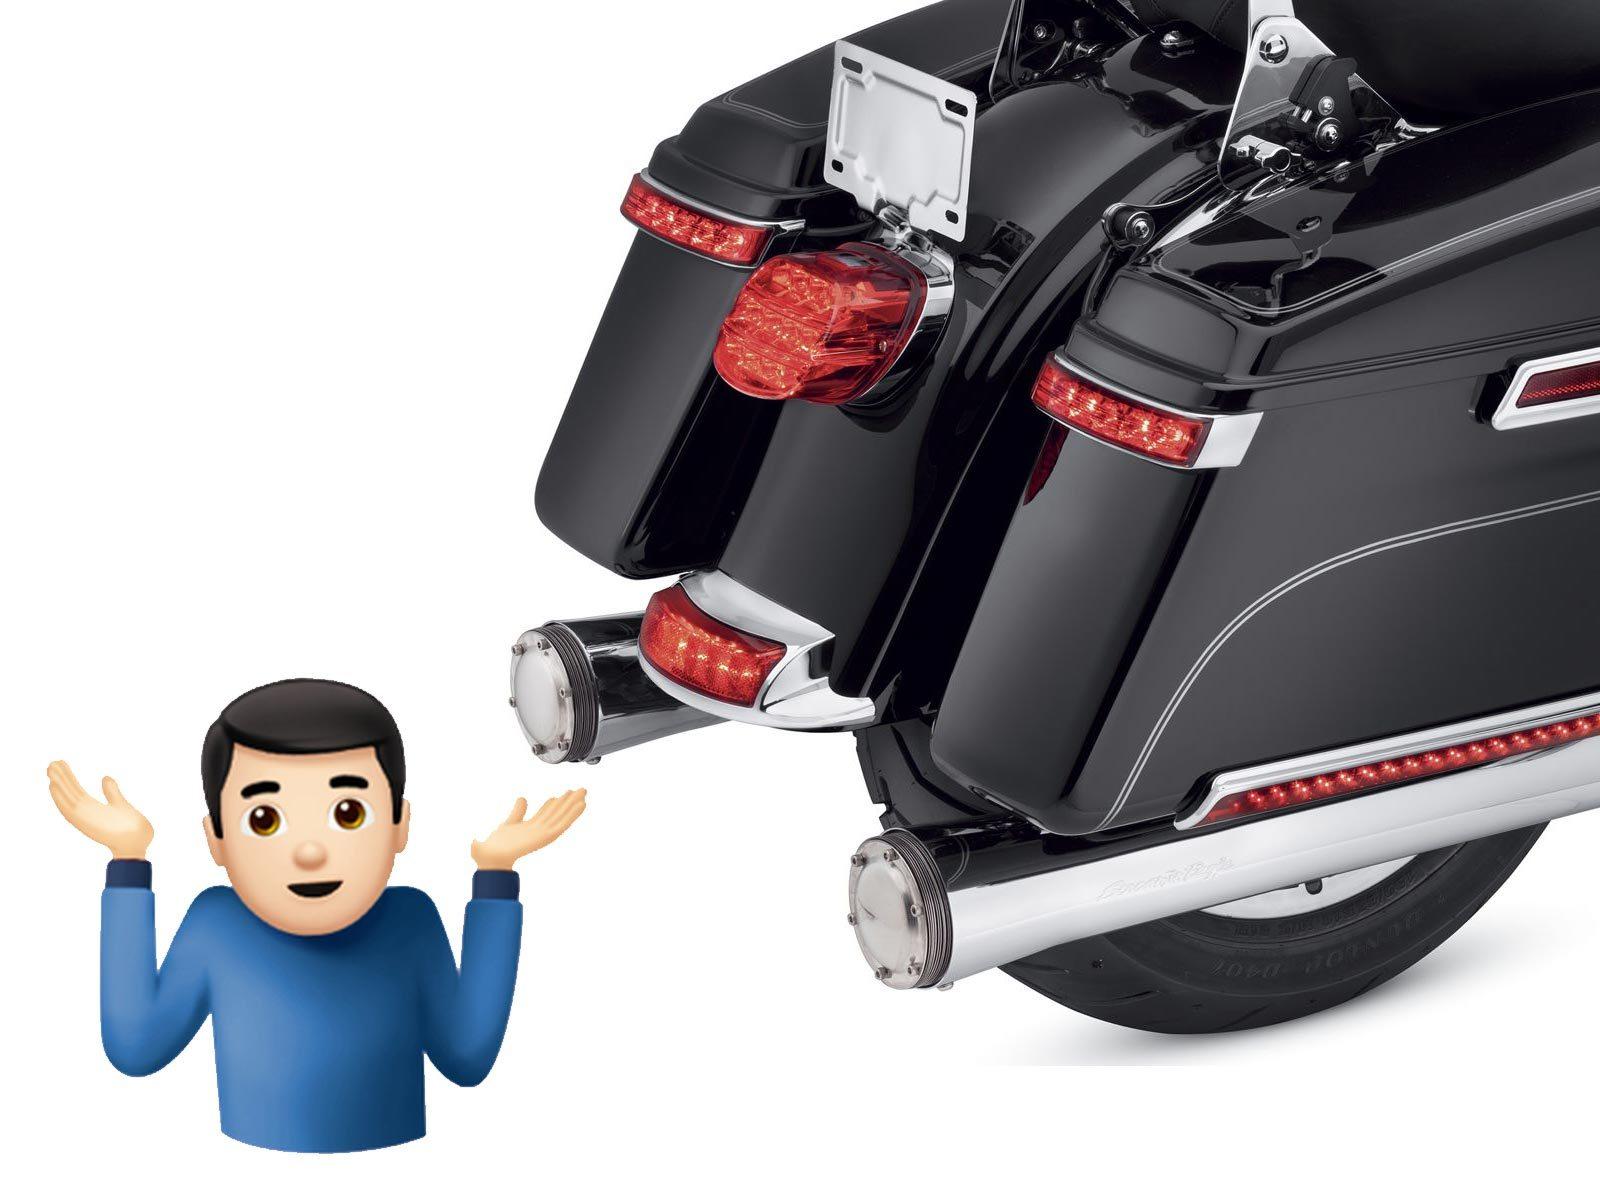 Over 12,000 Harley-Davidsons Recalled for Missing Reflectors-harley-davidson-detachable-tour-pak-luggage-conversion.jpg